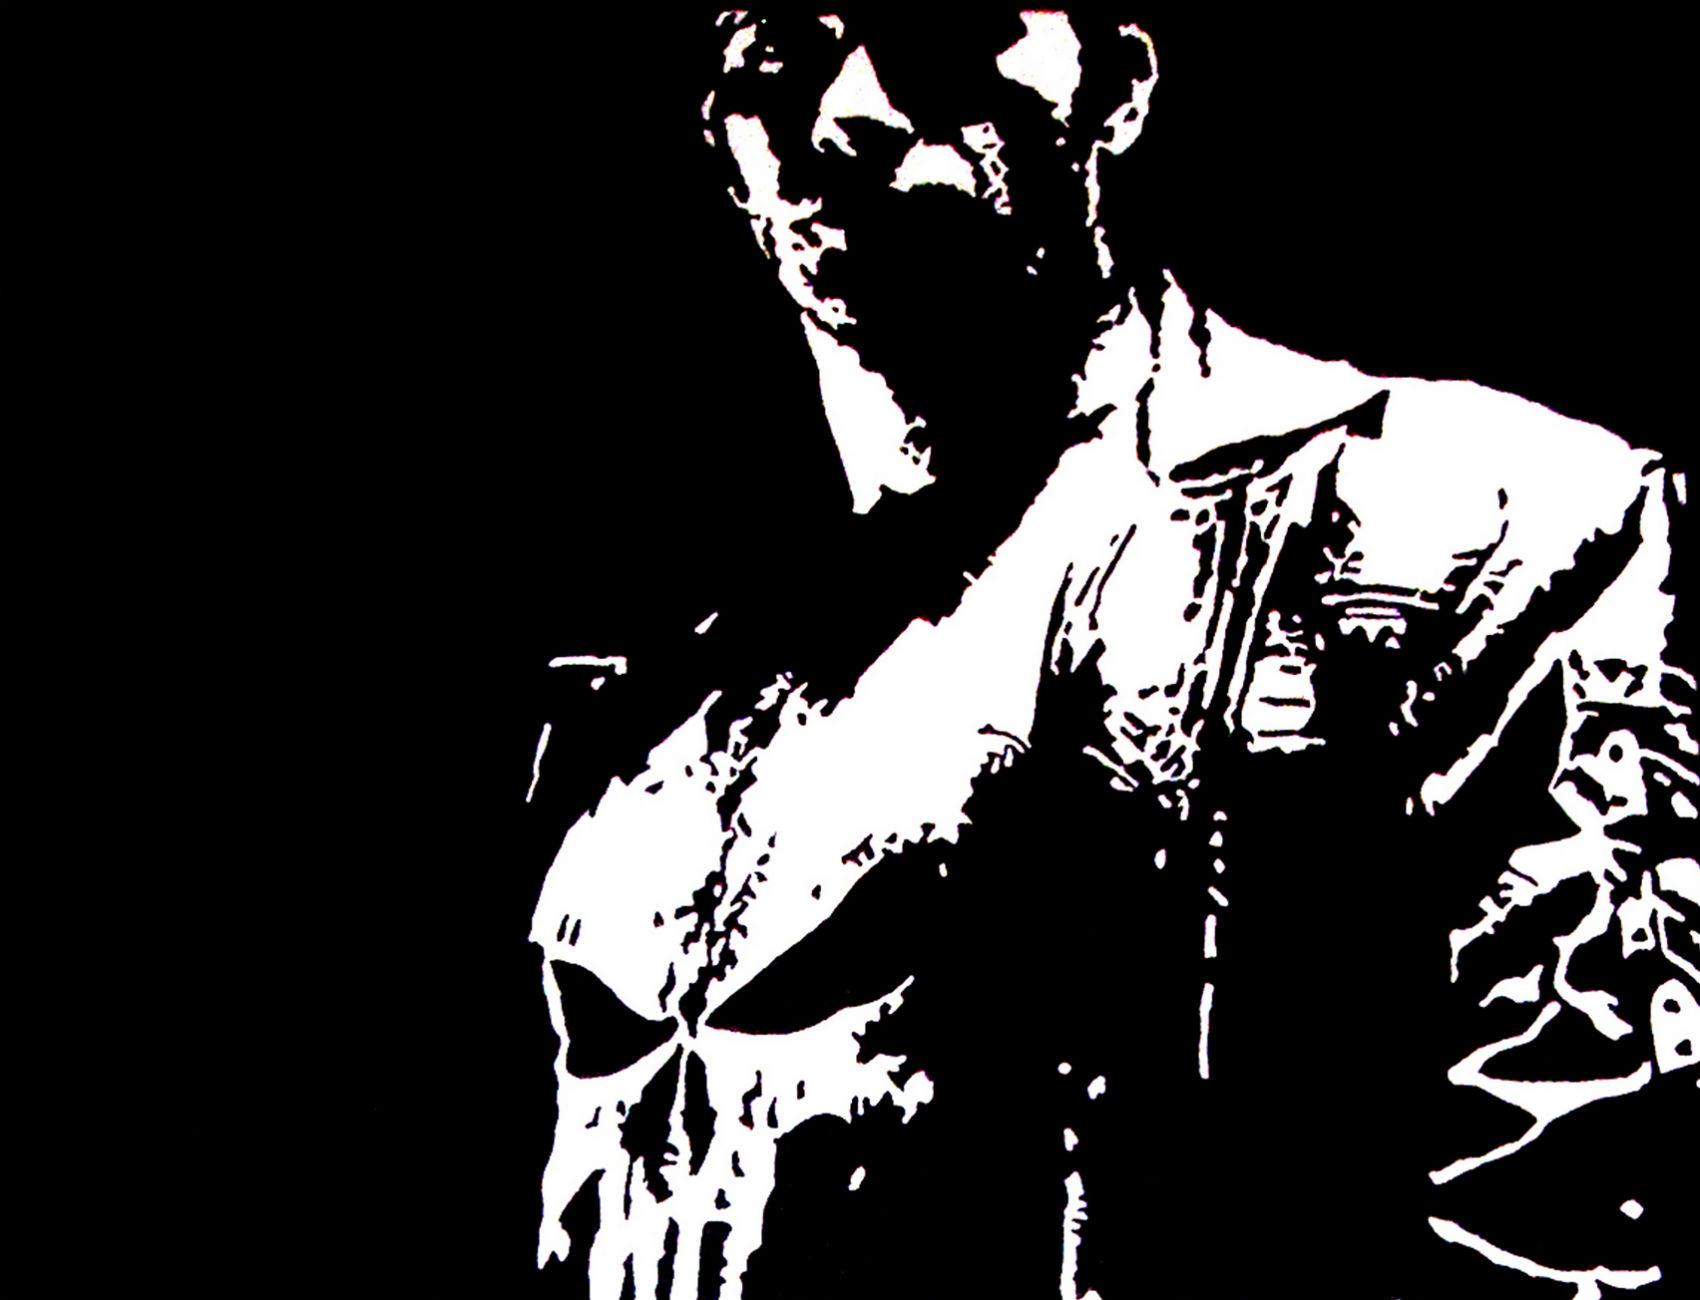 THE PUNISHER marvel wallpaper | 1700x1300 | 140062 | WallpaperUP